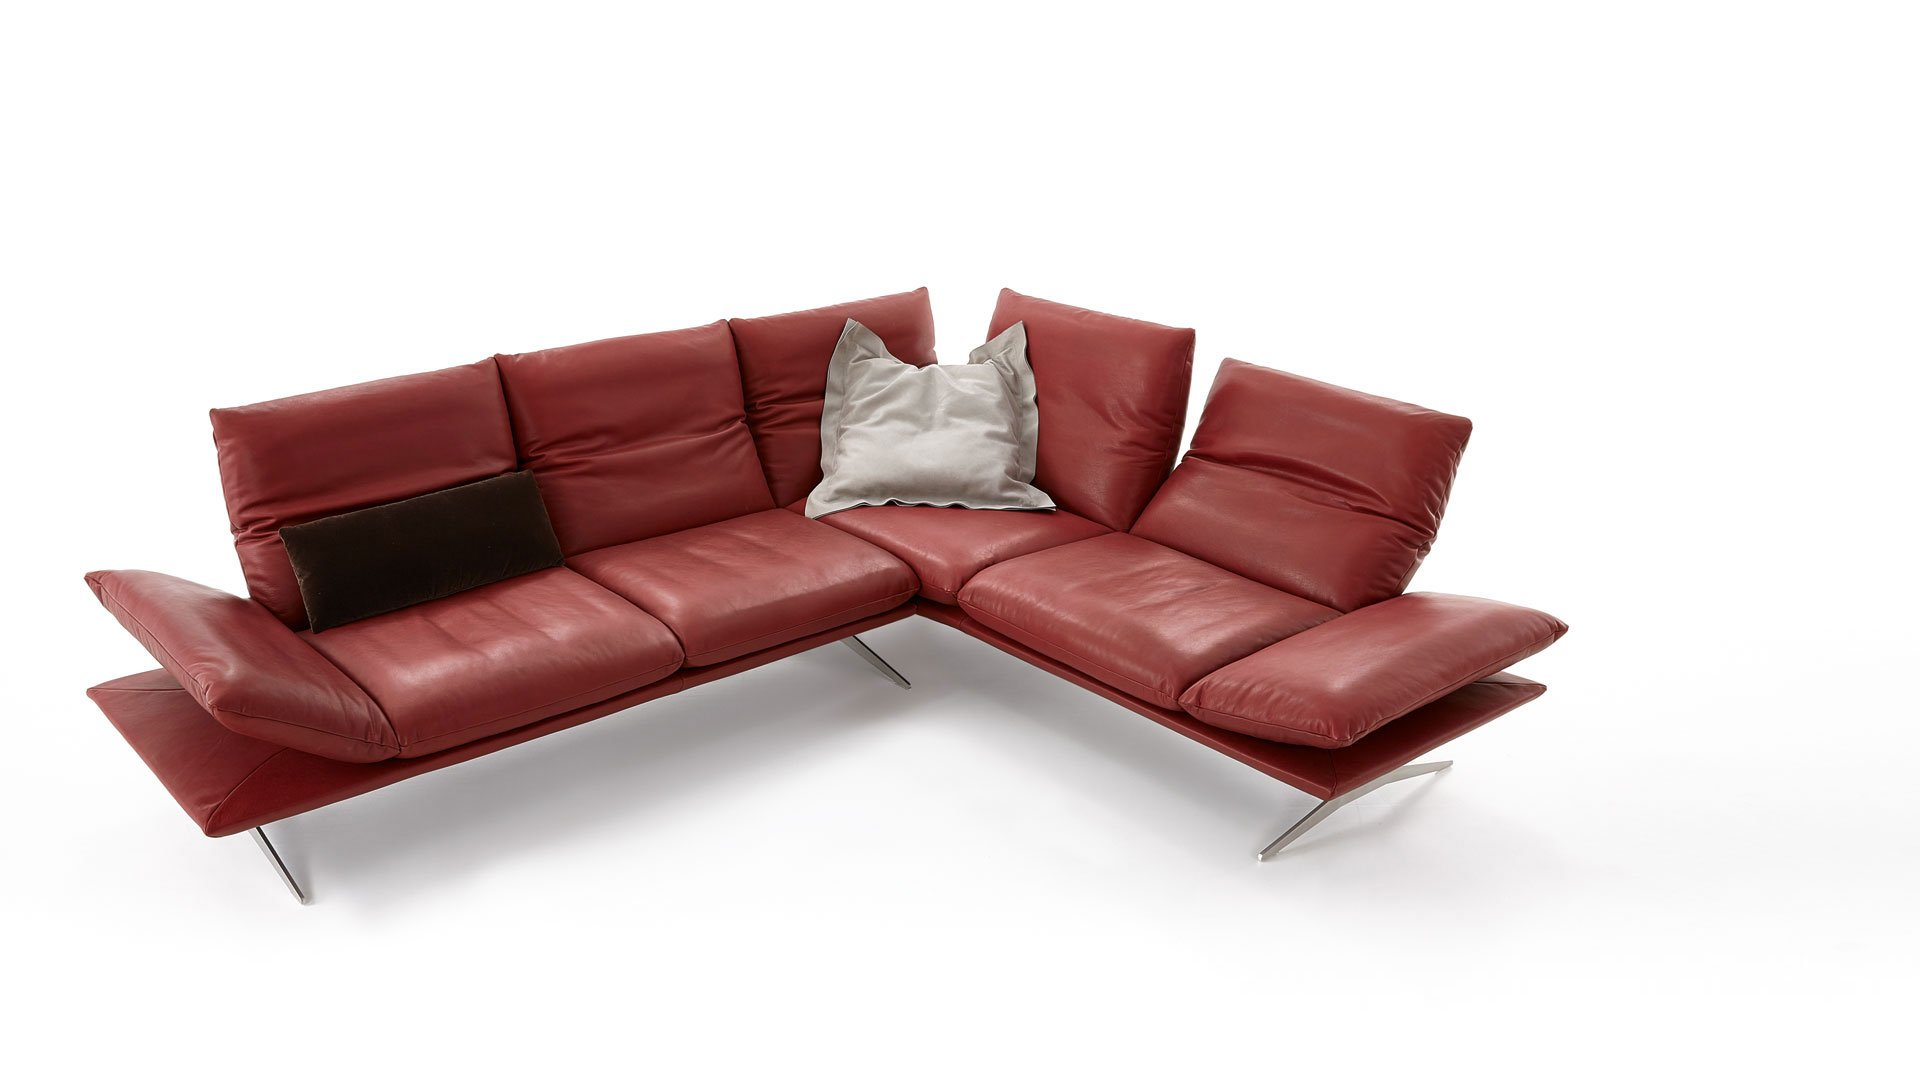 francis home style. Black Bedroom Furniture Sets. Home Design Ideas